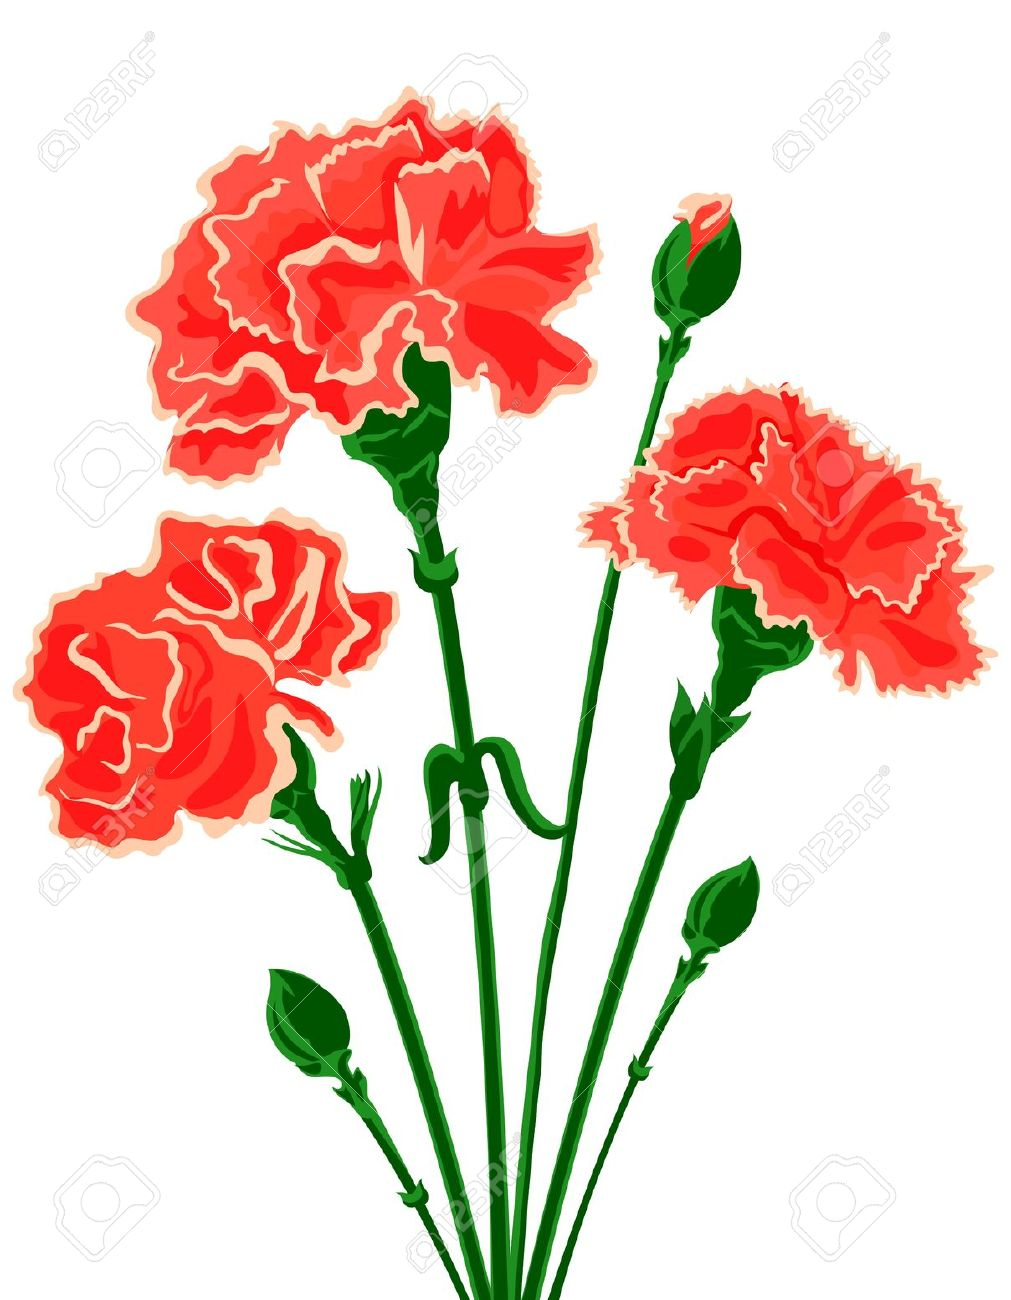 carnation like clipart clipground carnation clipart silhouette carnation clipart black and white